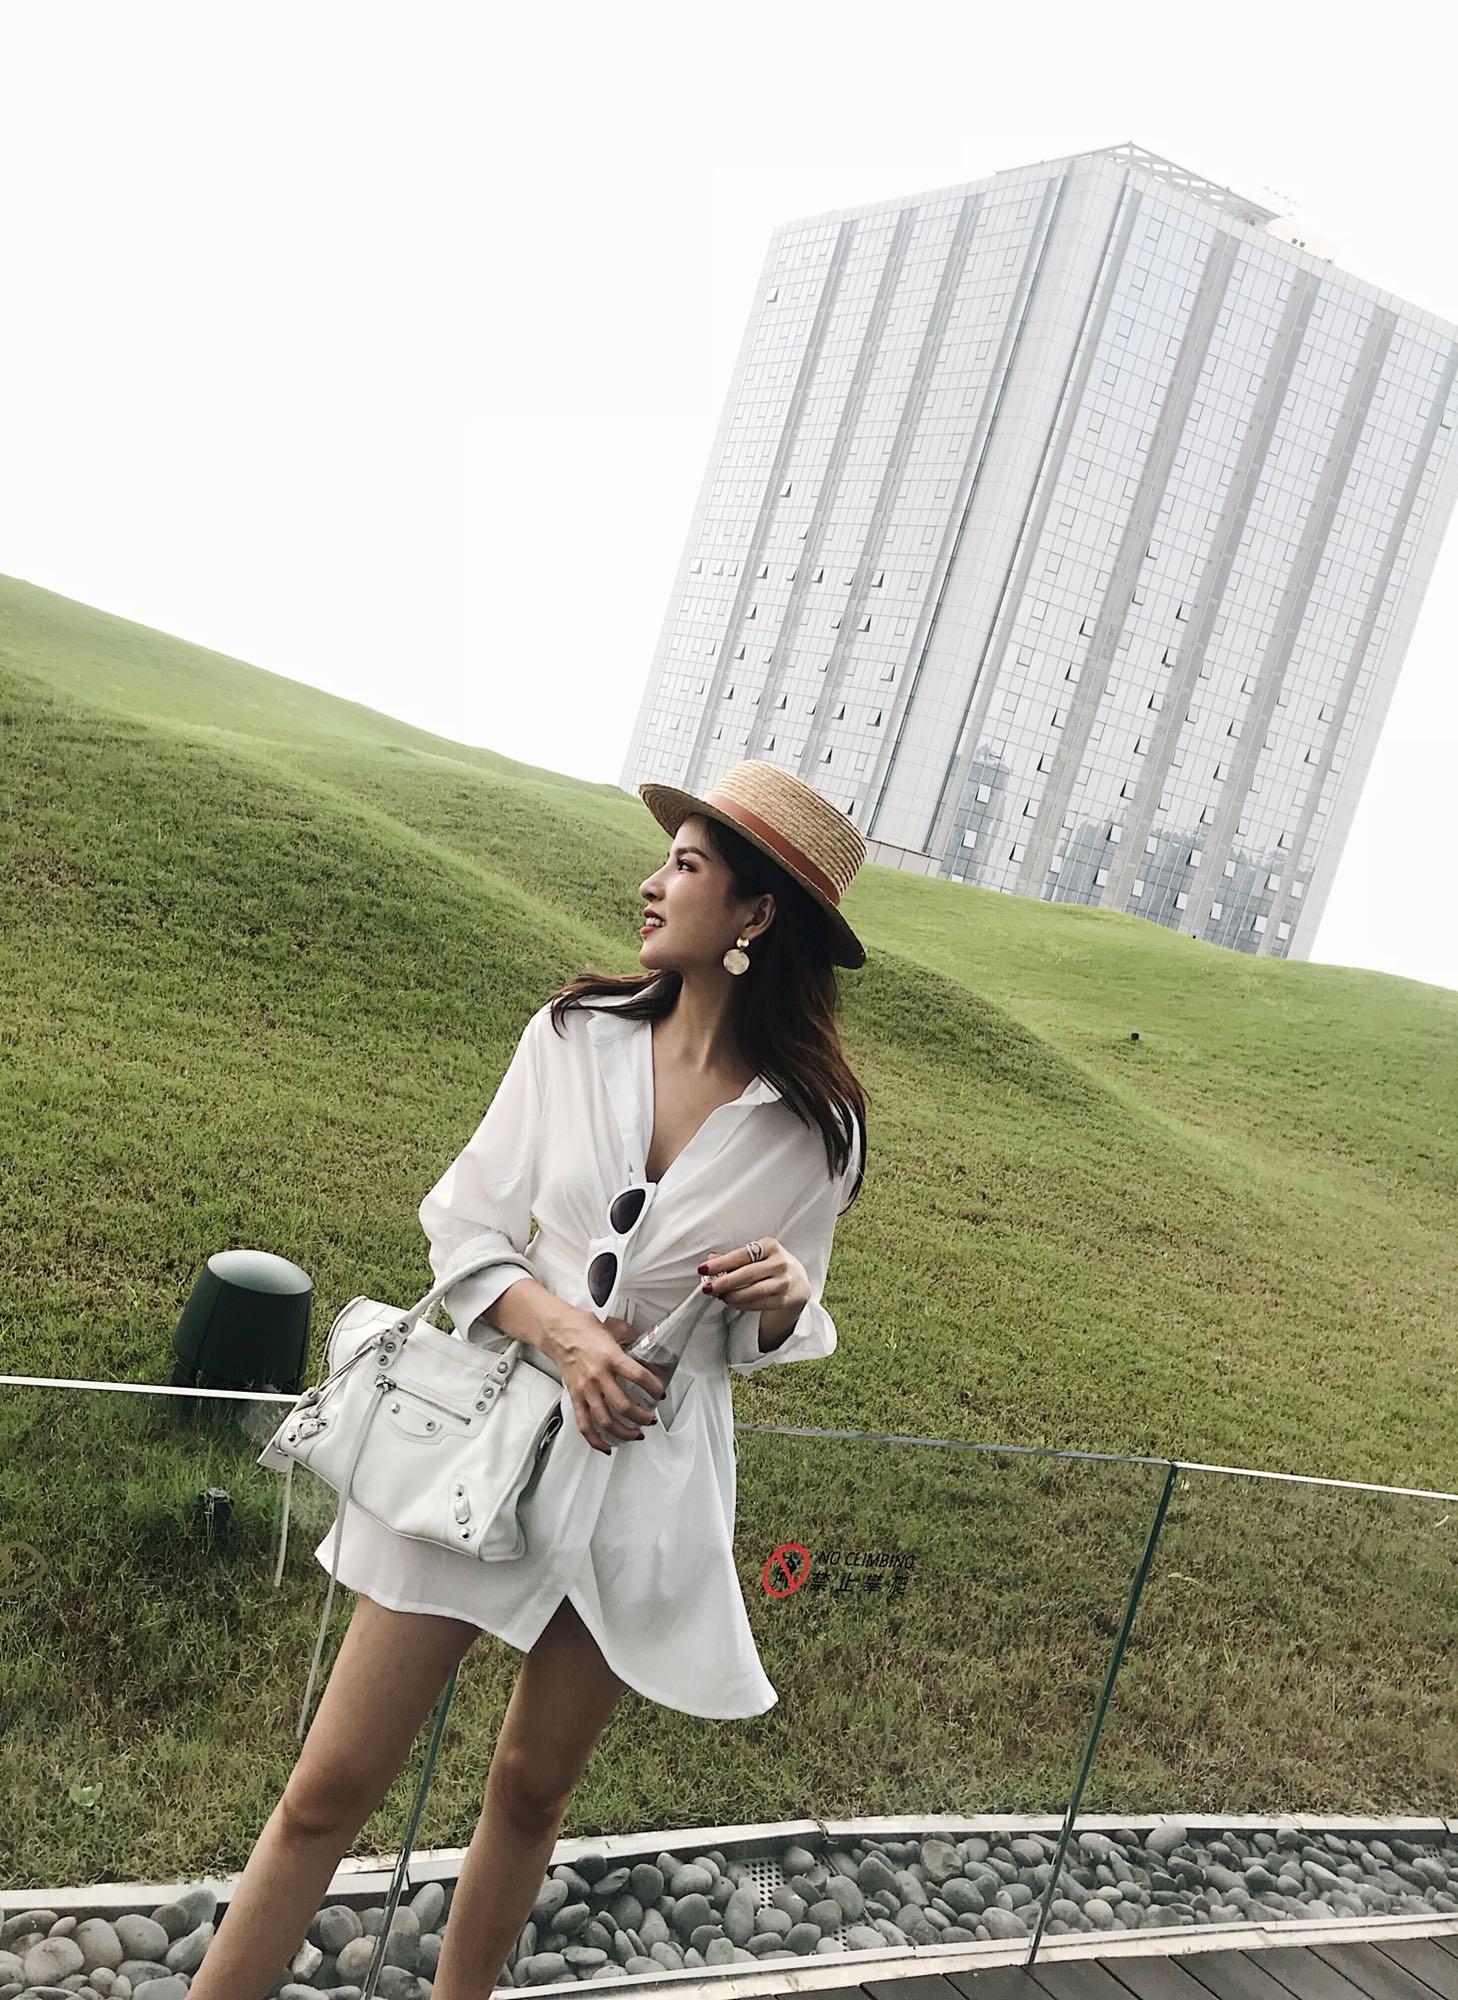 UMI2018新品秋装气质假两件衬衫裙女两件套收腰ins超火极简冷淡风